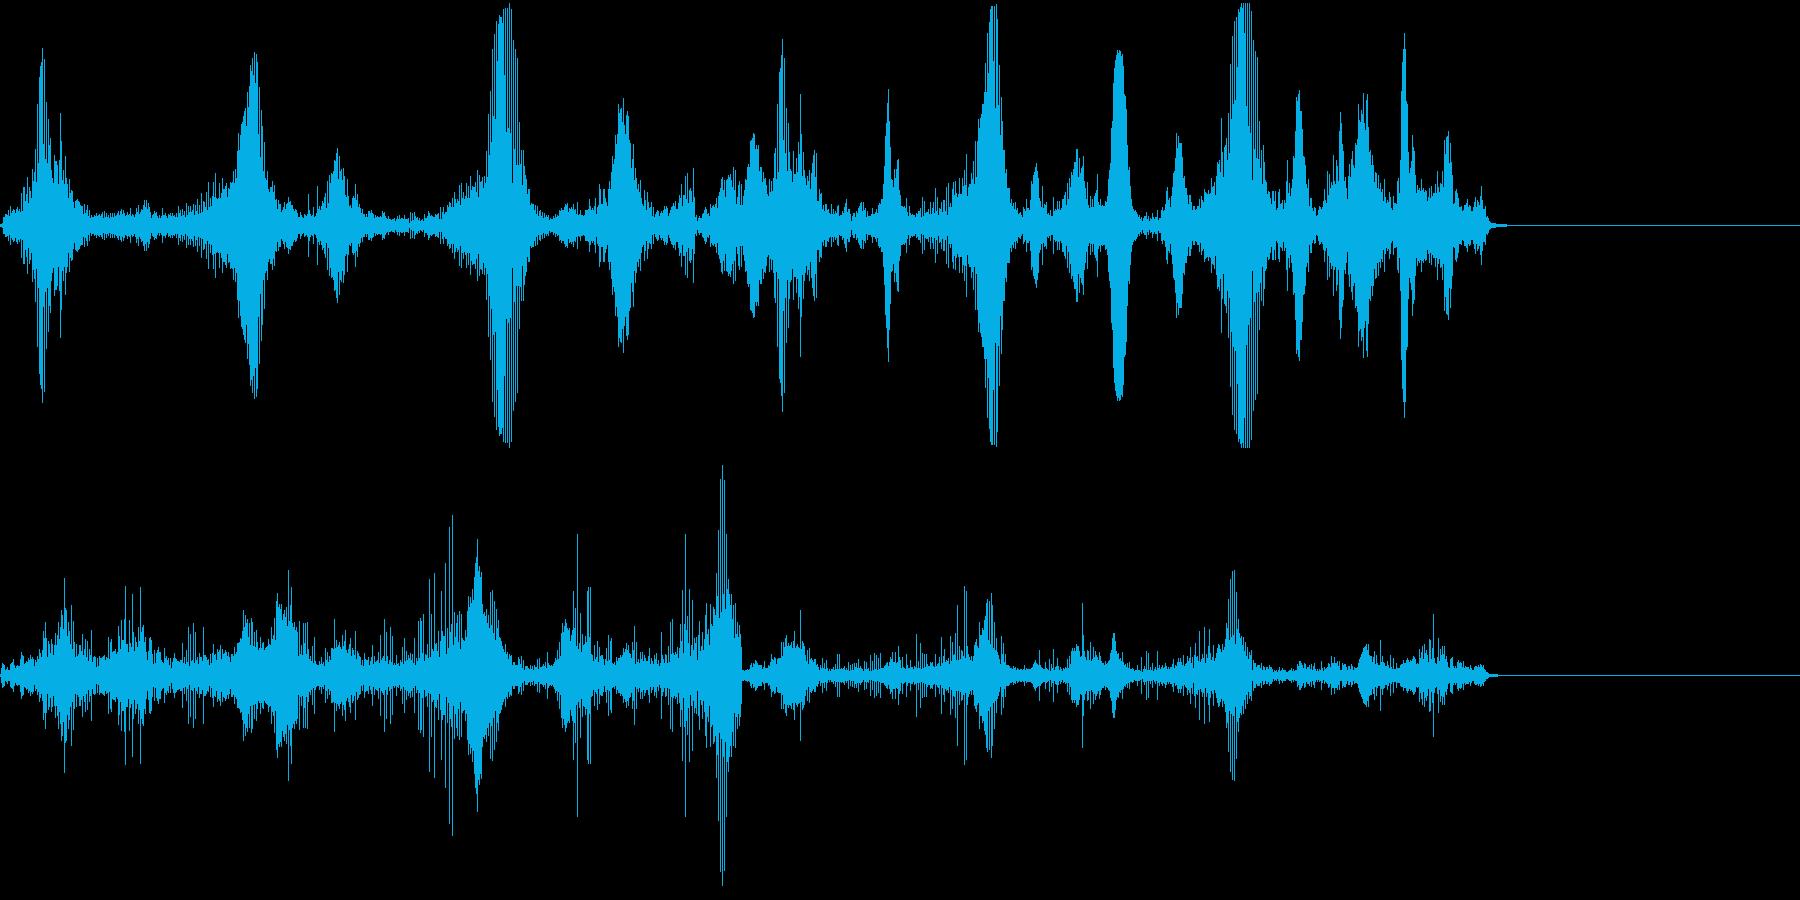 【SE 効果音】不気味な音6の再生済みの波形